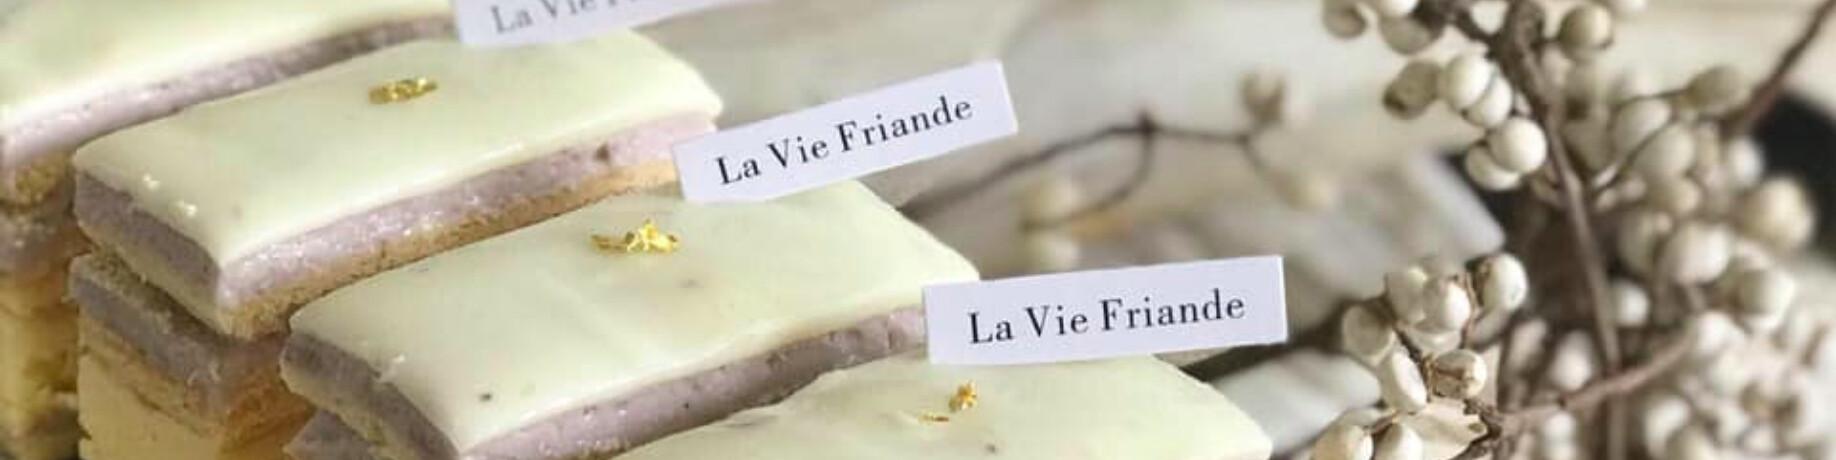 La Vie Friande 香・甜生活 陳孝怡老師